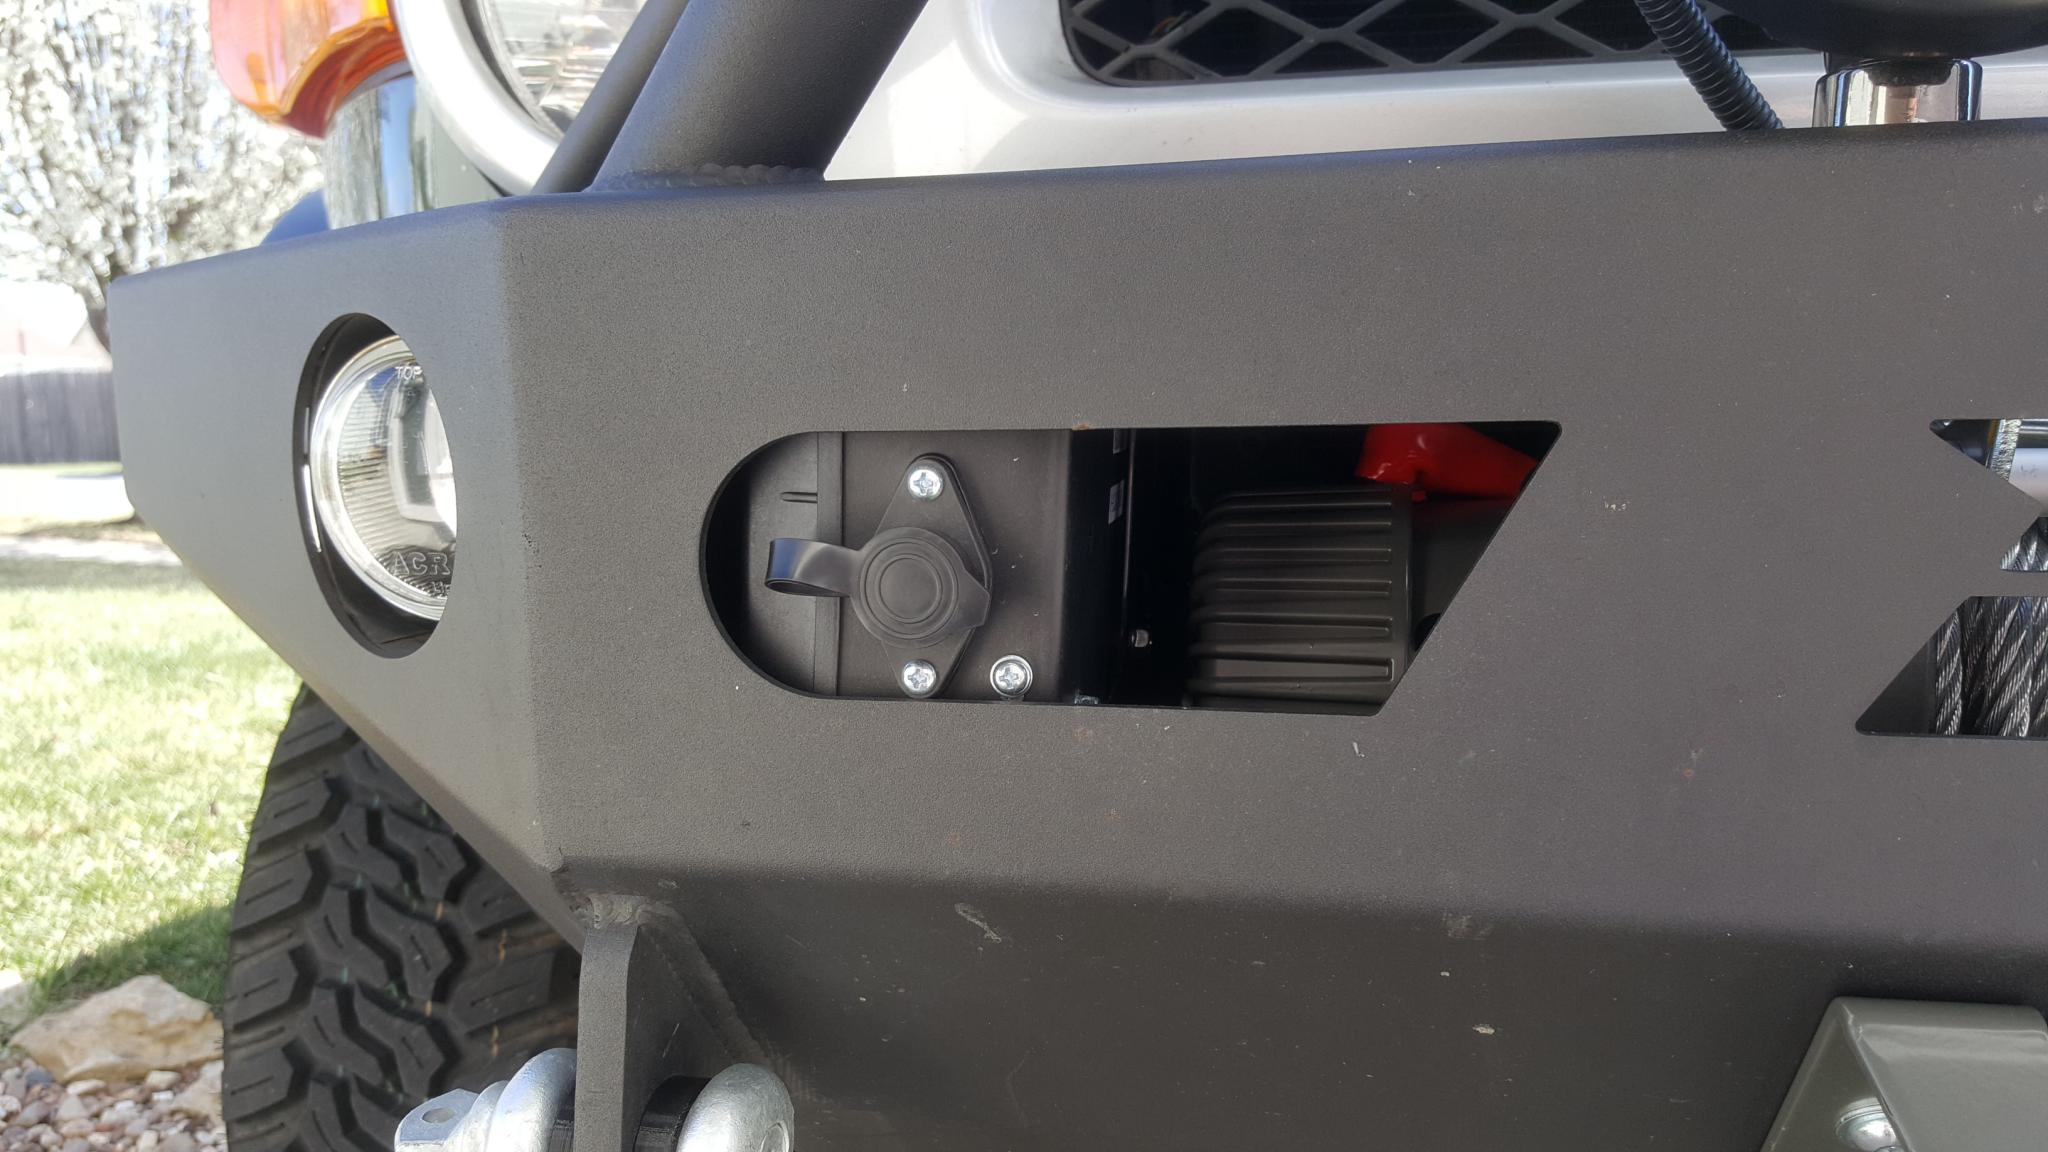 Badlands winch in a Demello bumper - Toyota FJ Cruiser Forum